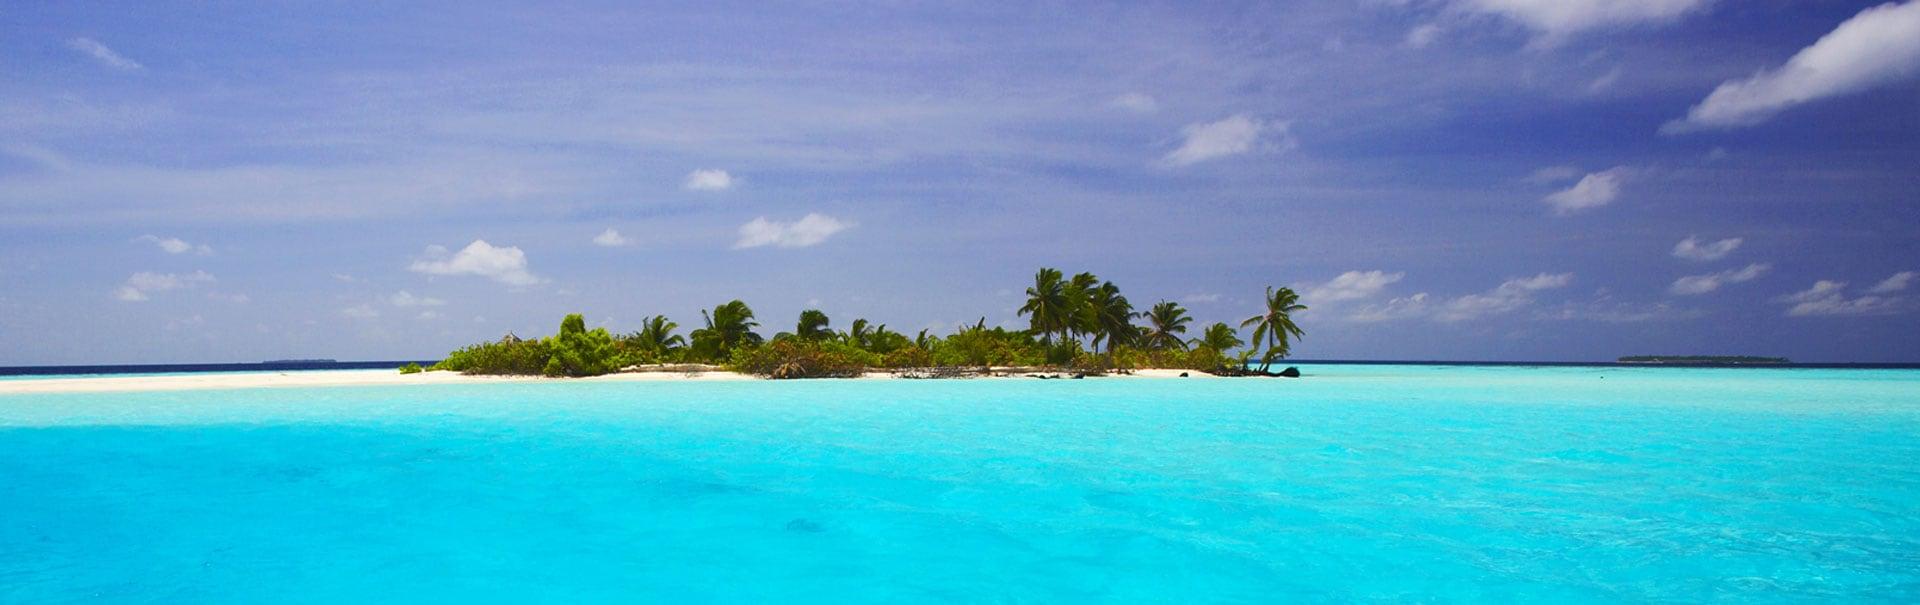 imageUrlhttps://img.veenaworld.com/customized-holidays/world/maldives/shml1/shml1-bnn-1.jpg